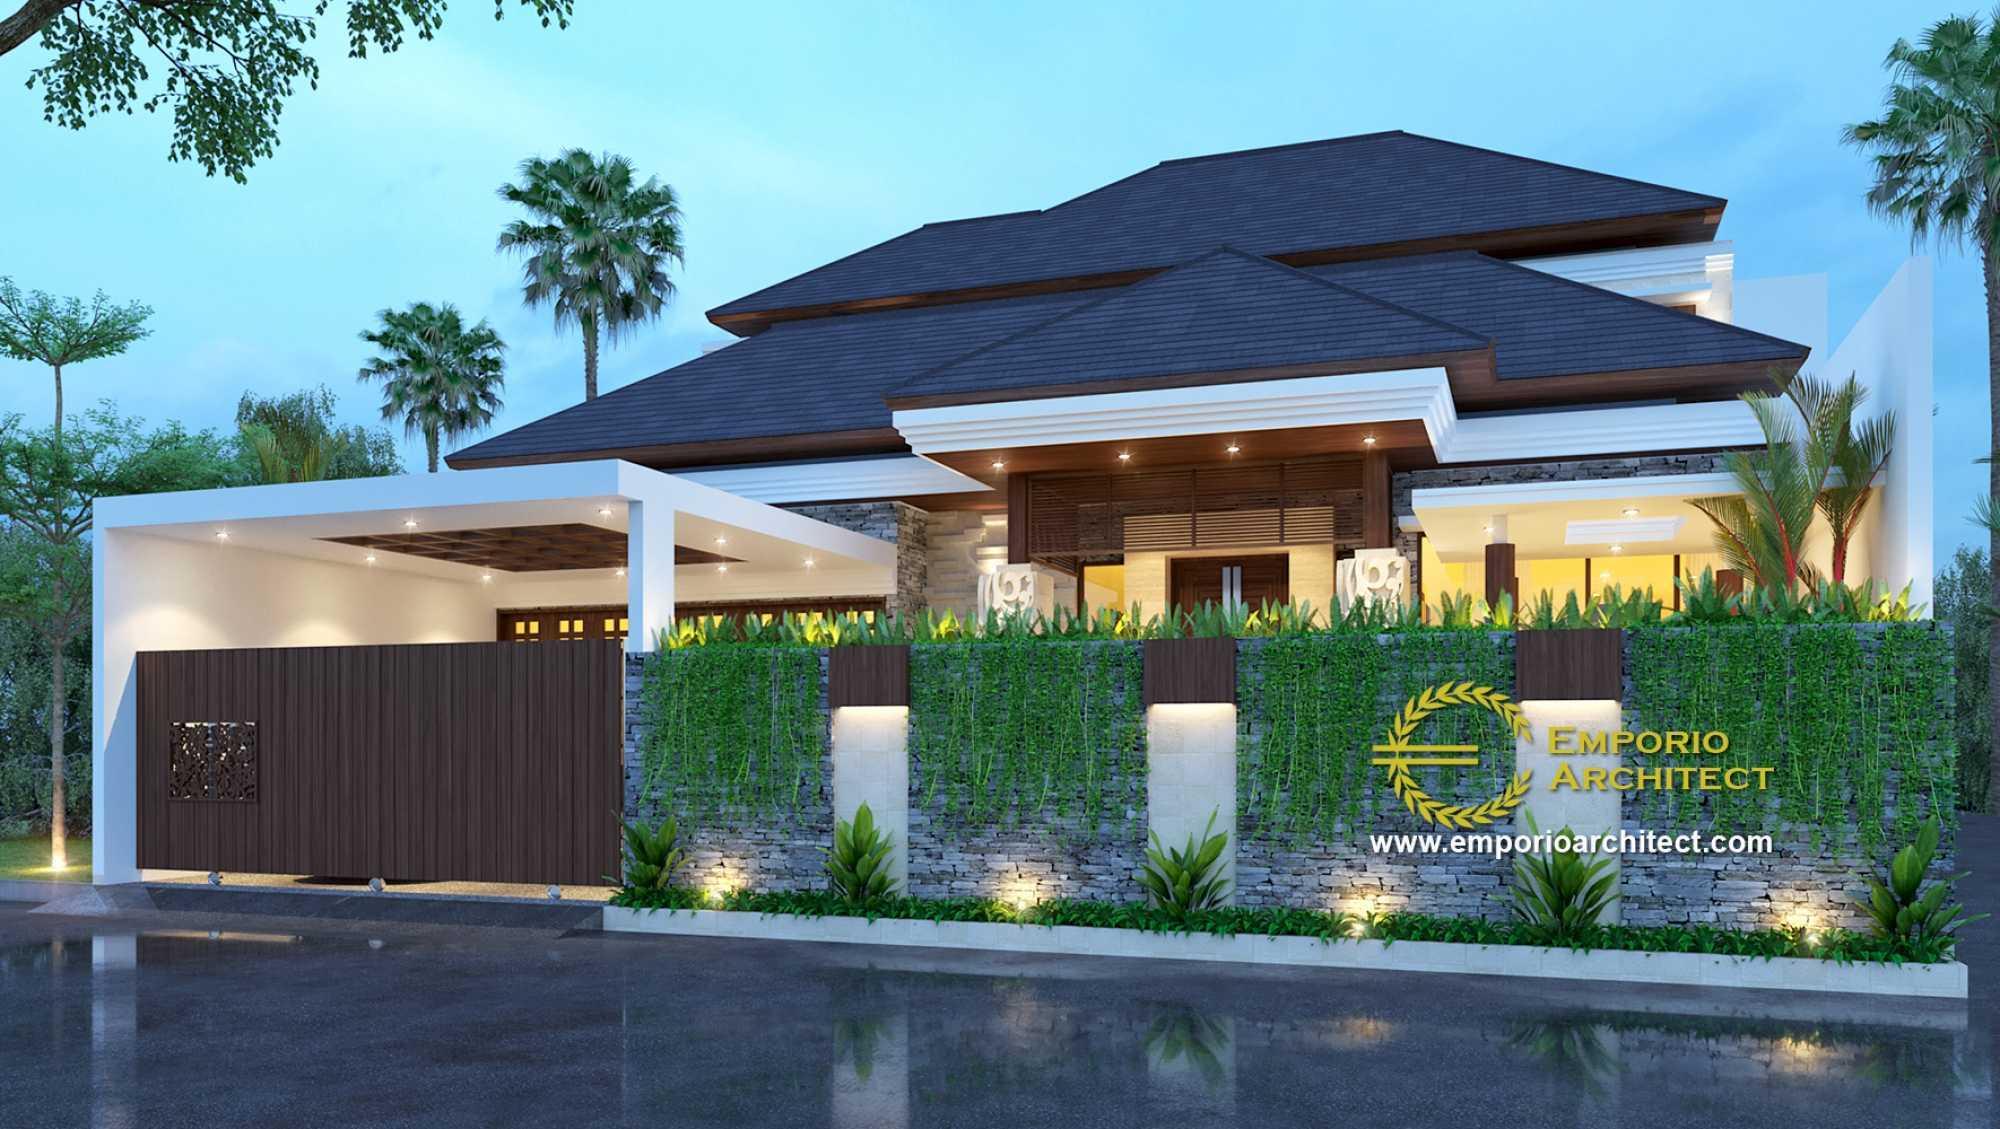 Emporio Architect Desain Rumah Villa Bali Tropis 317 @ Bogor Bogor, Jawa Barat, Indonesia Bogor, Jawa Barat, Indonesia Emporio-Architect-Desain-Rumah-Villa-Bali-Tropis-317-Bogor  74109